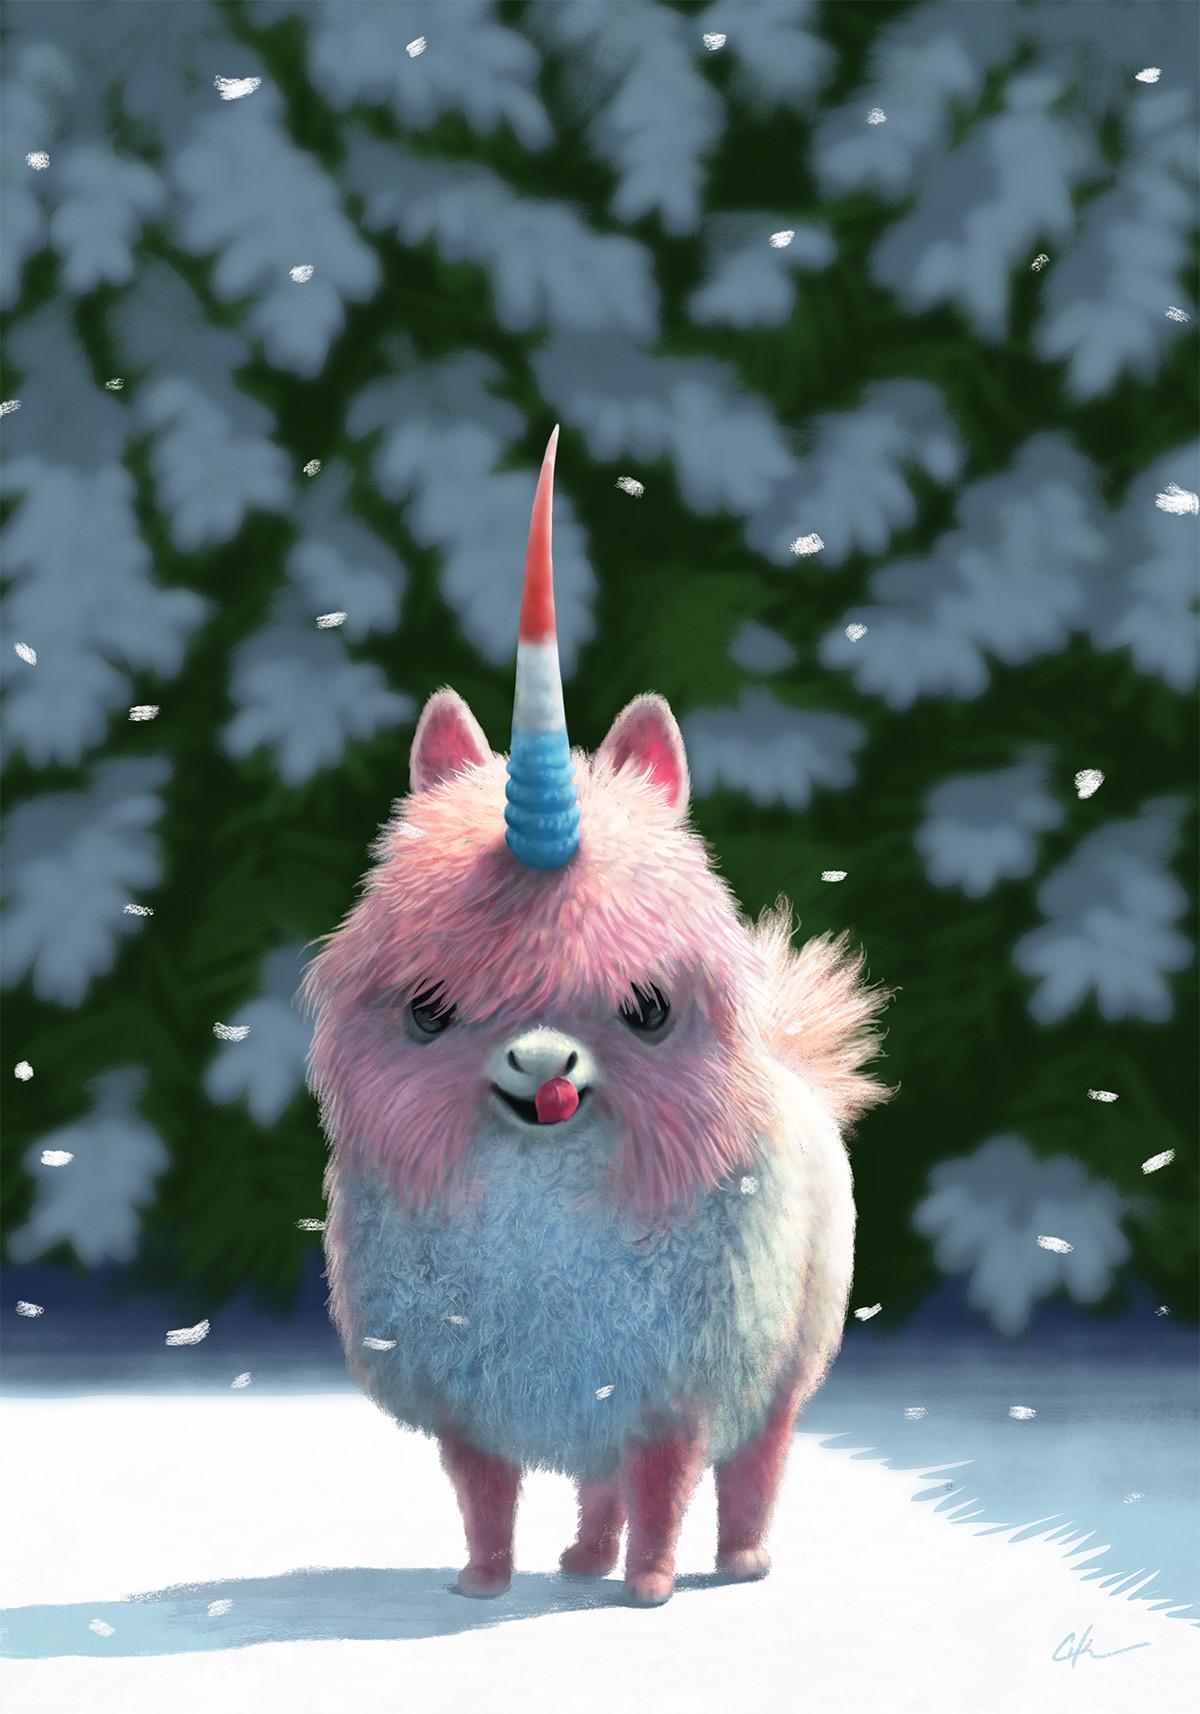 bobby-chiu-pink-popsicle-unicorn3-sm.jpg